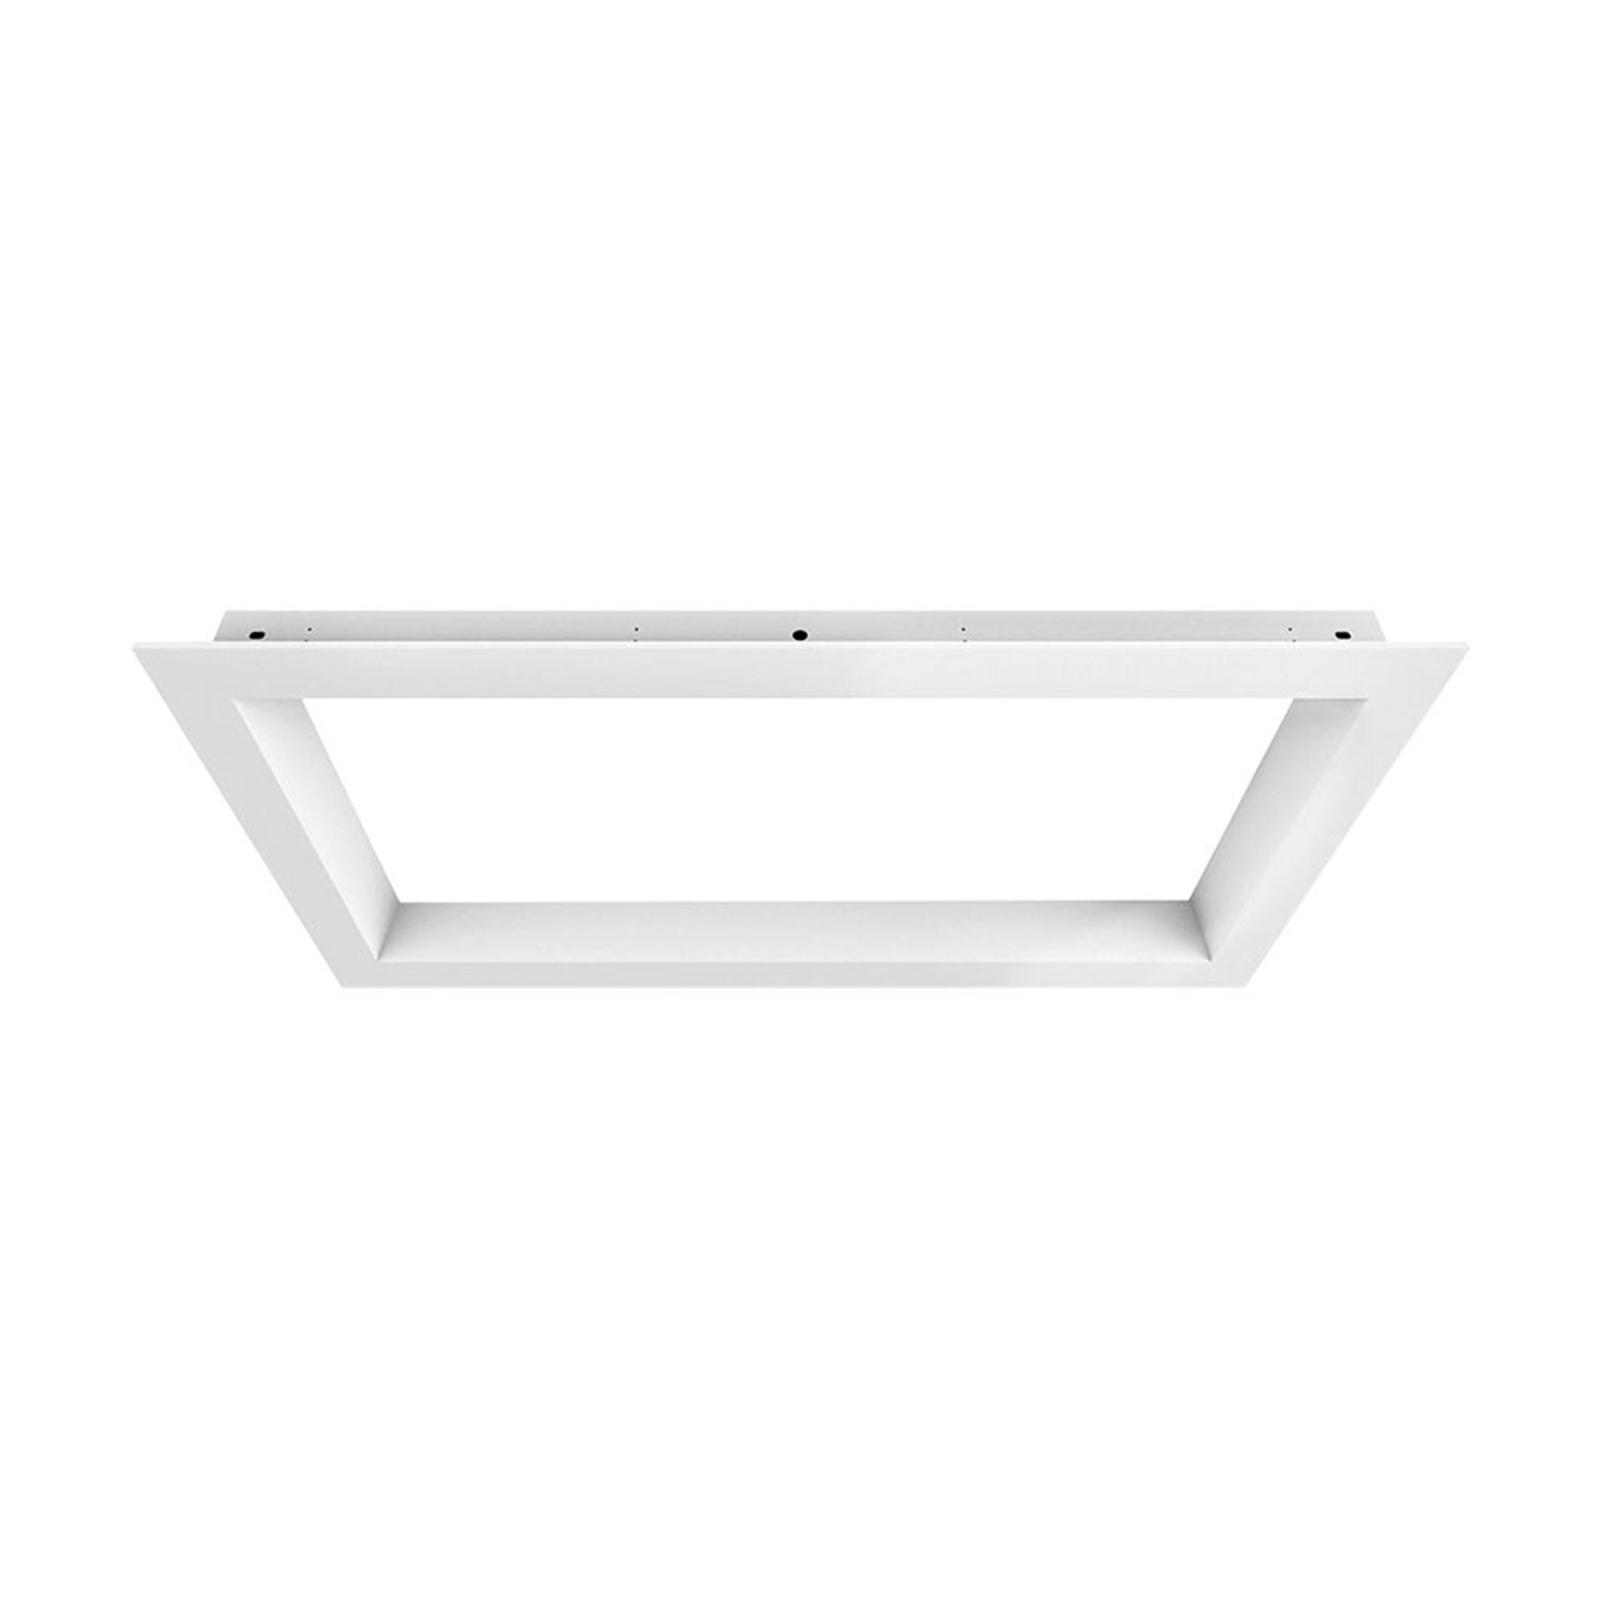 Monteringsramme LED-panel Sky Window 120 x 60 cm